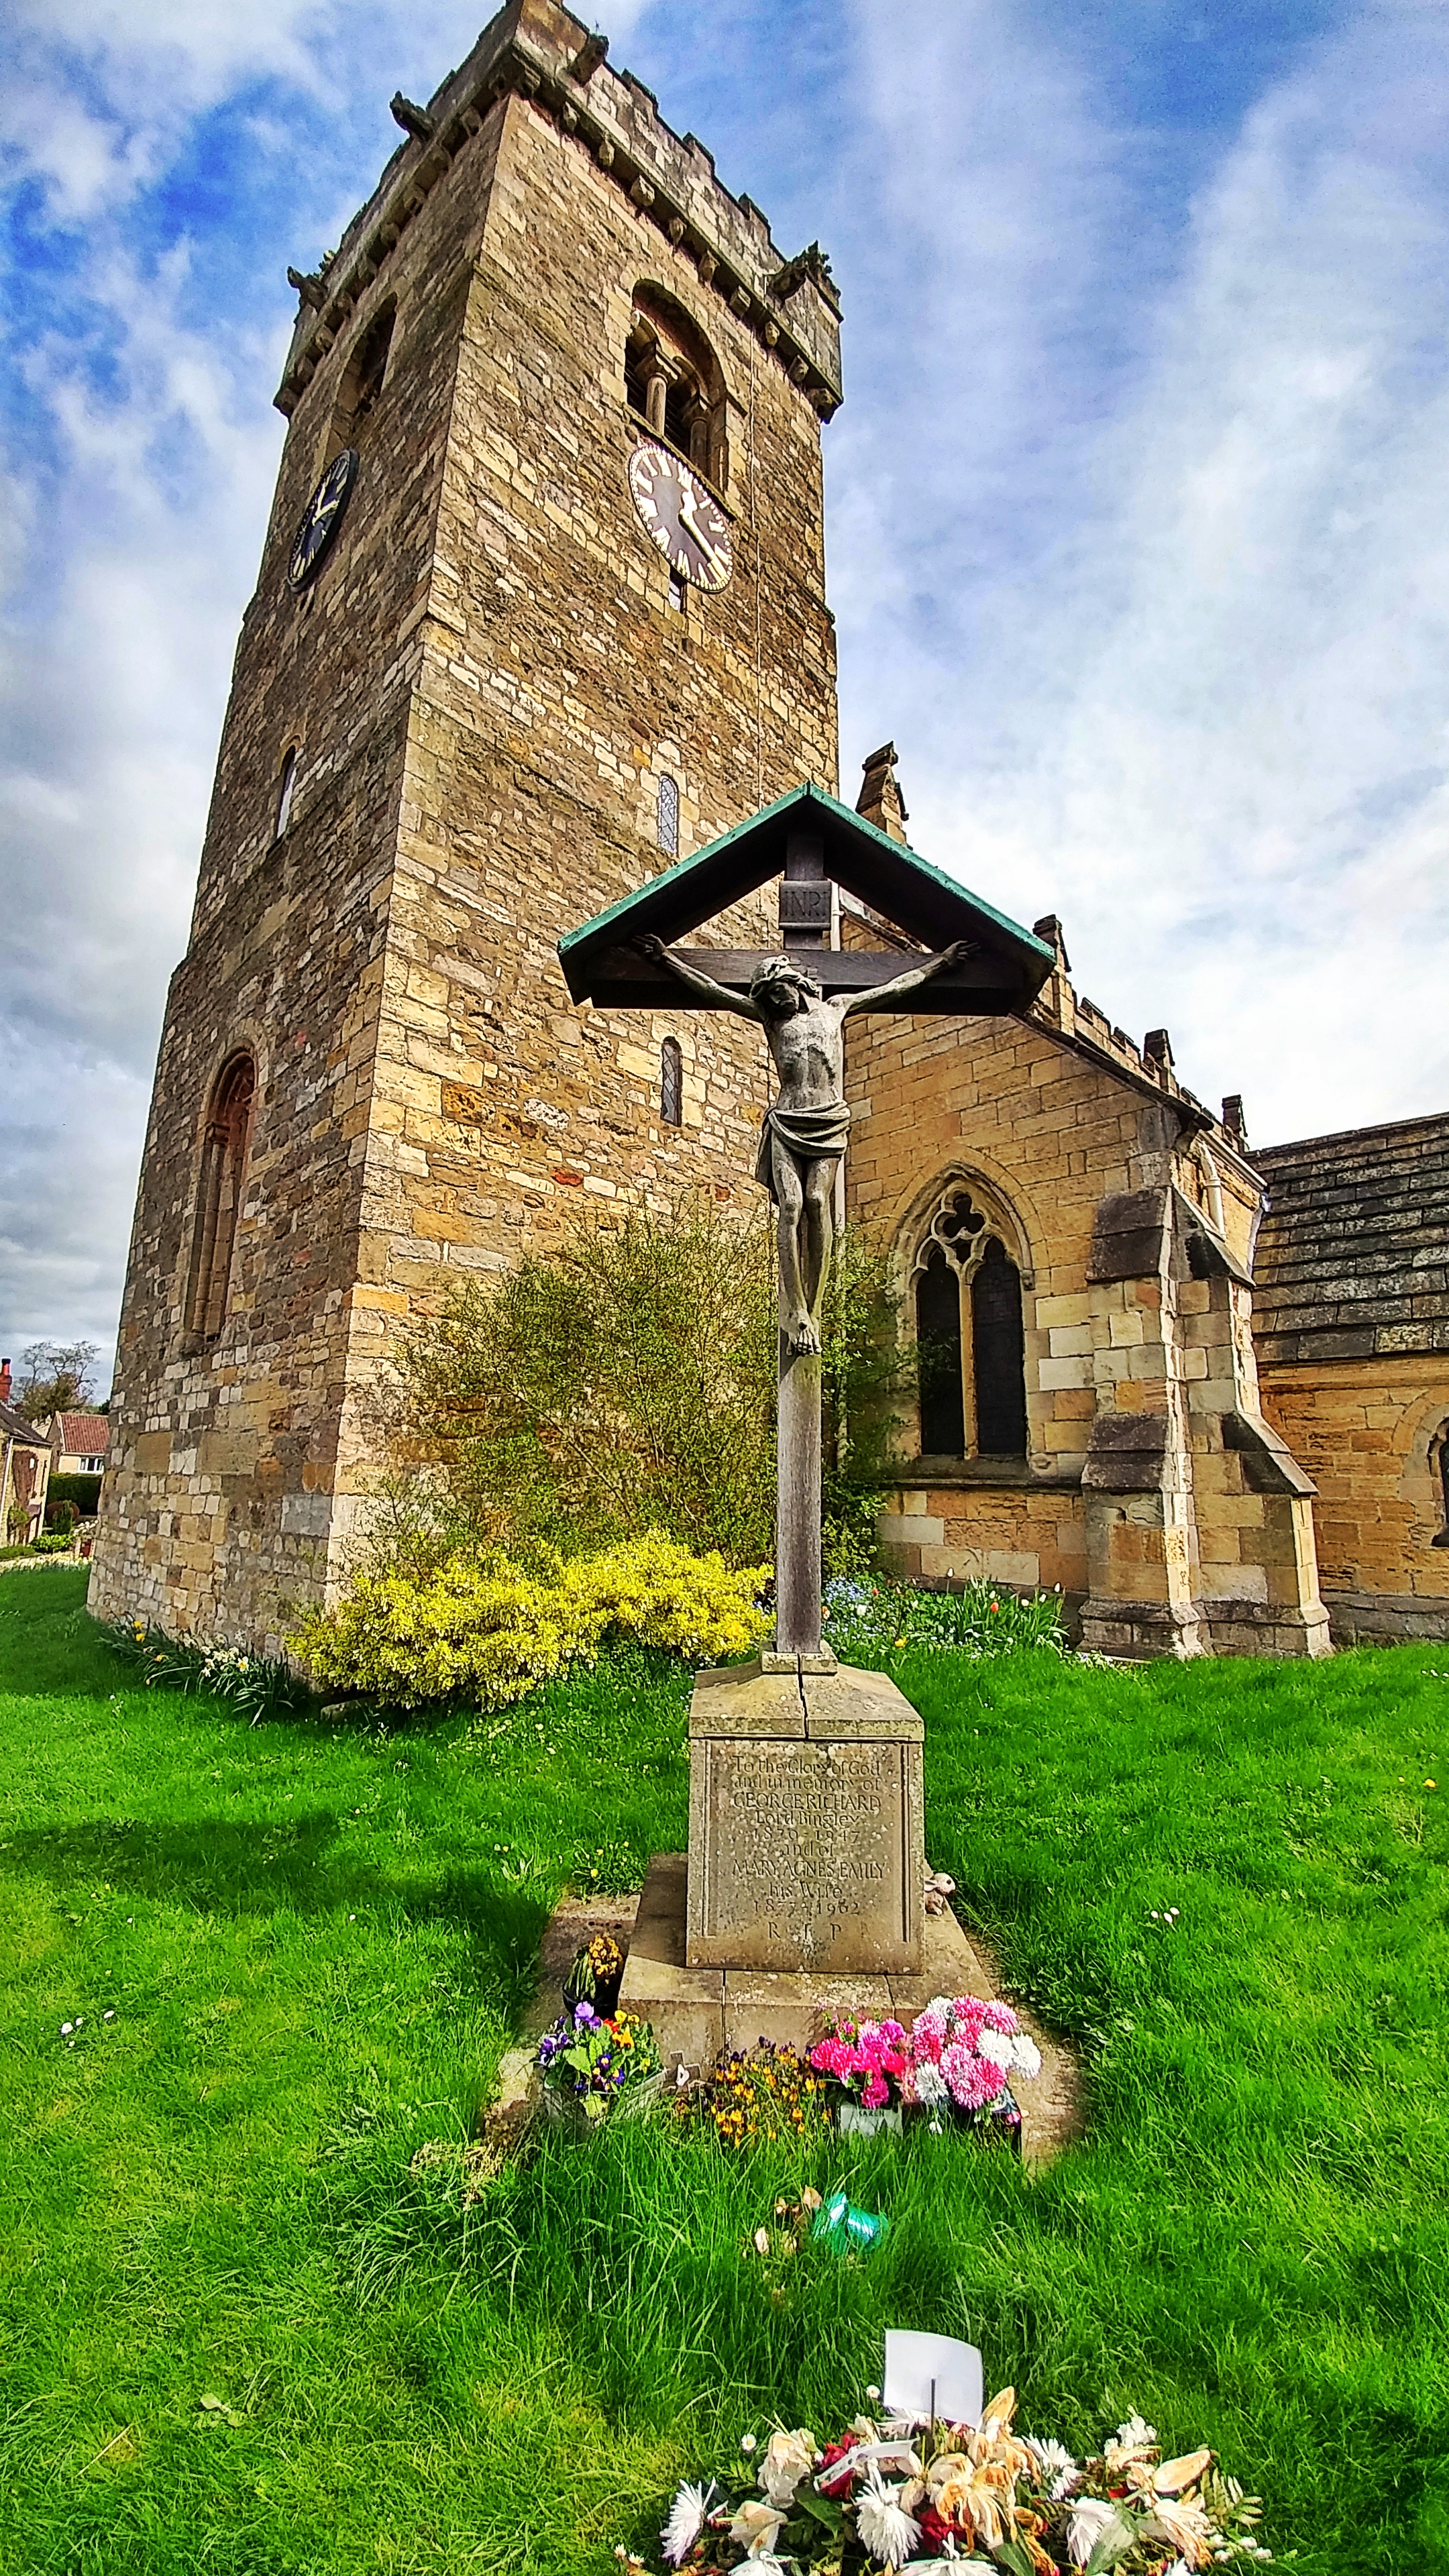 File:All Saints Church Bramham (41714679241).jpg - Wikimedia Commons